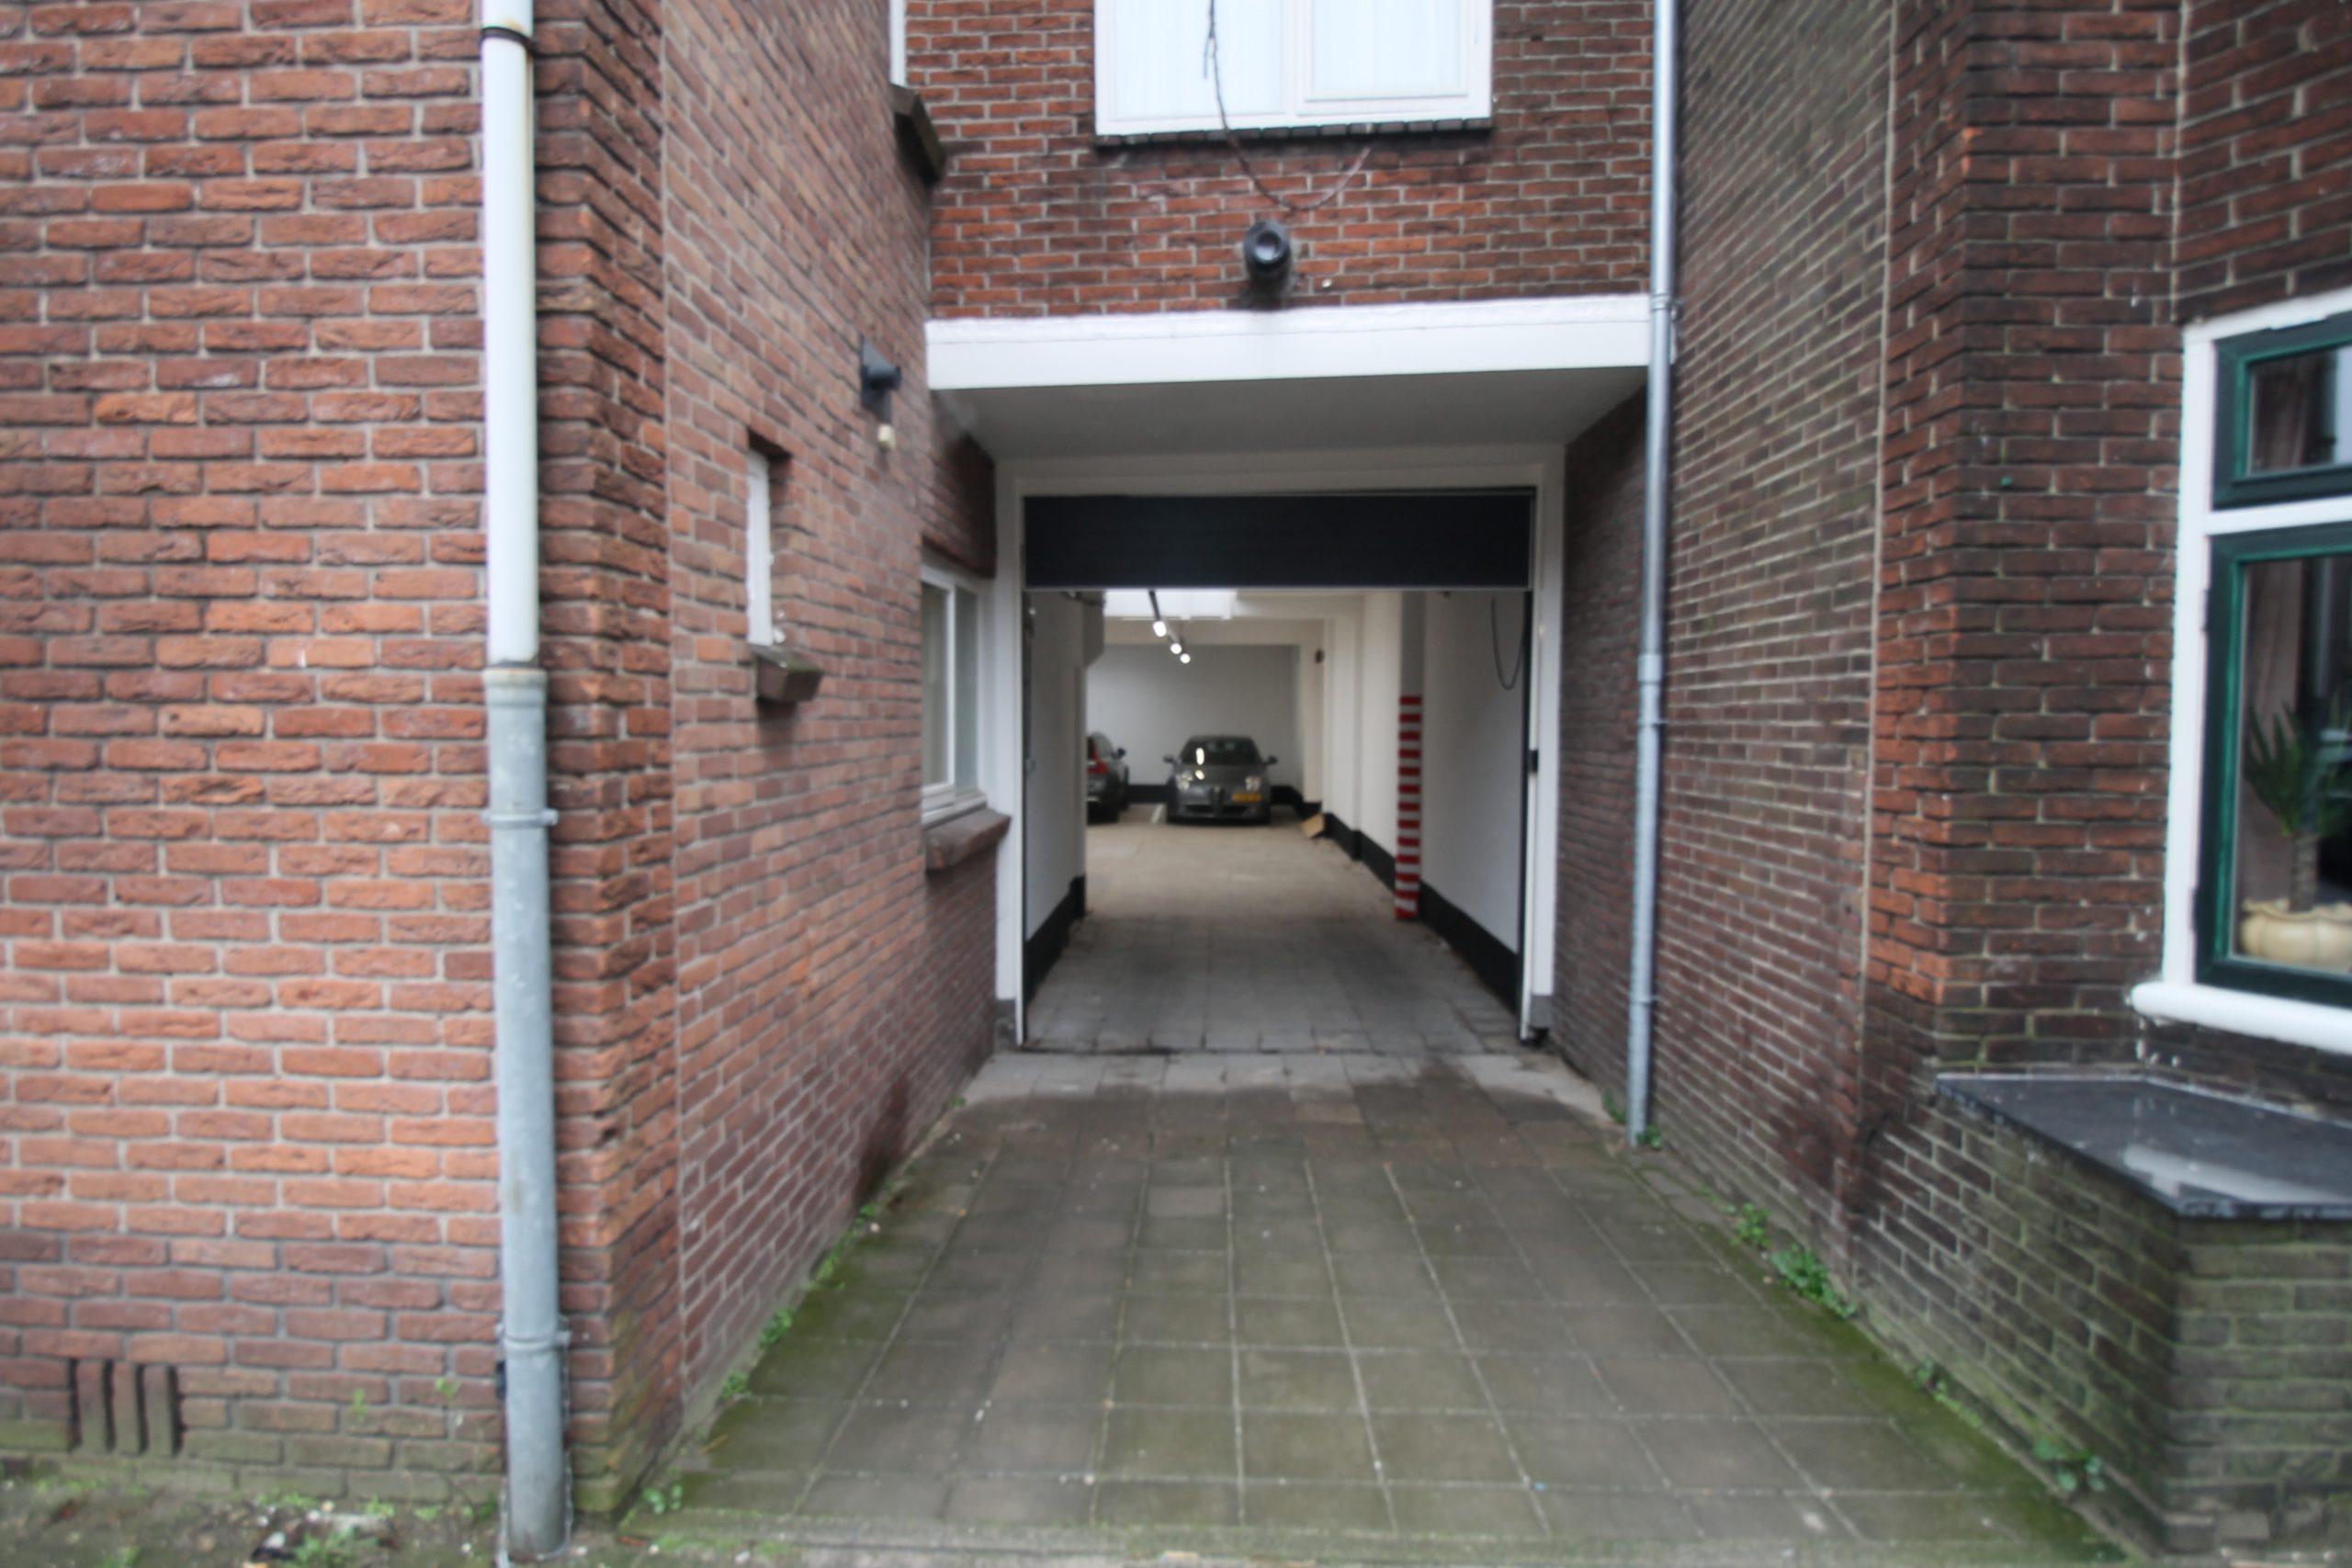 Motor Parkeerplaats Van s'Gravesandestraat 19